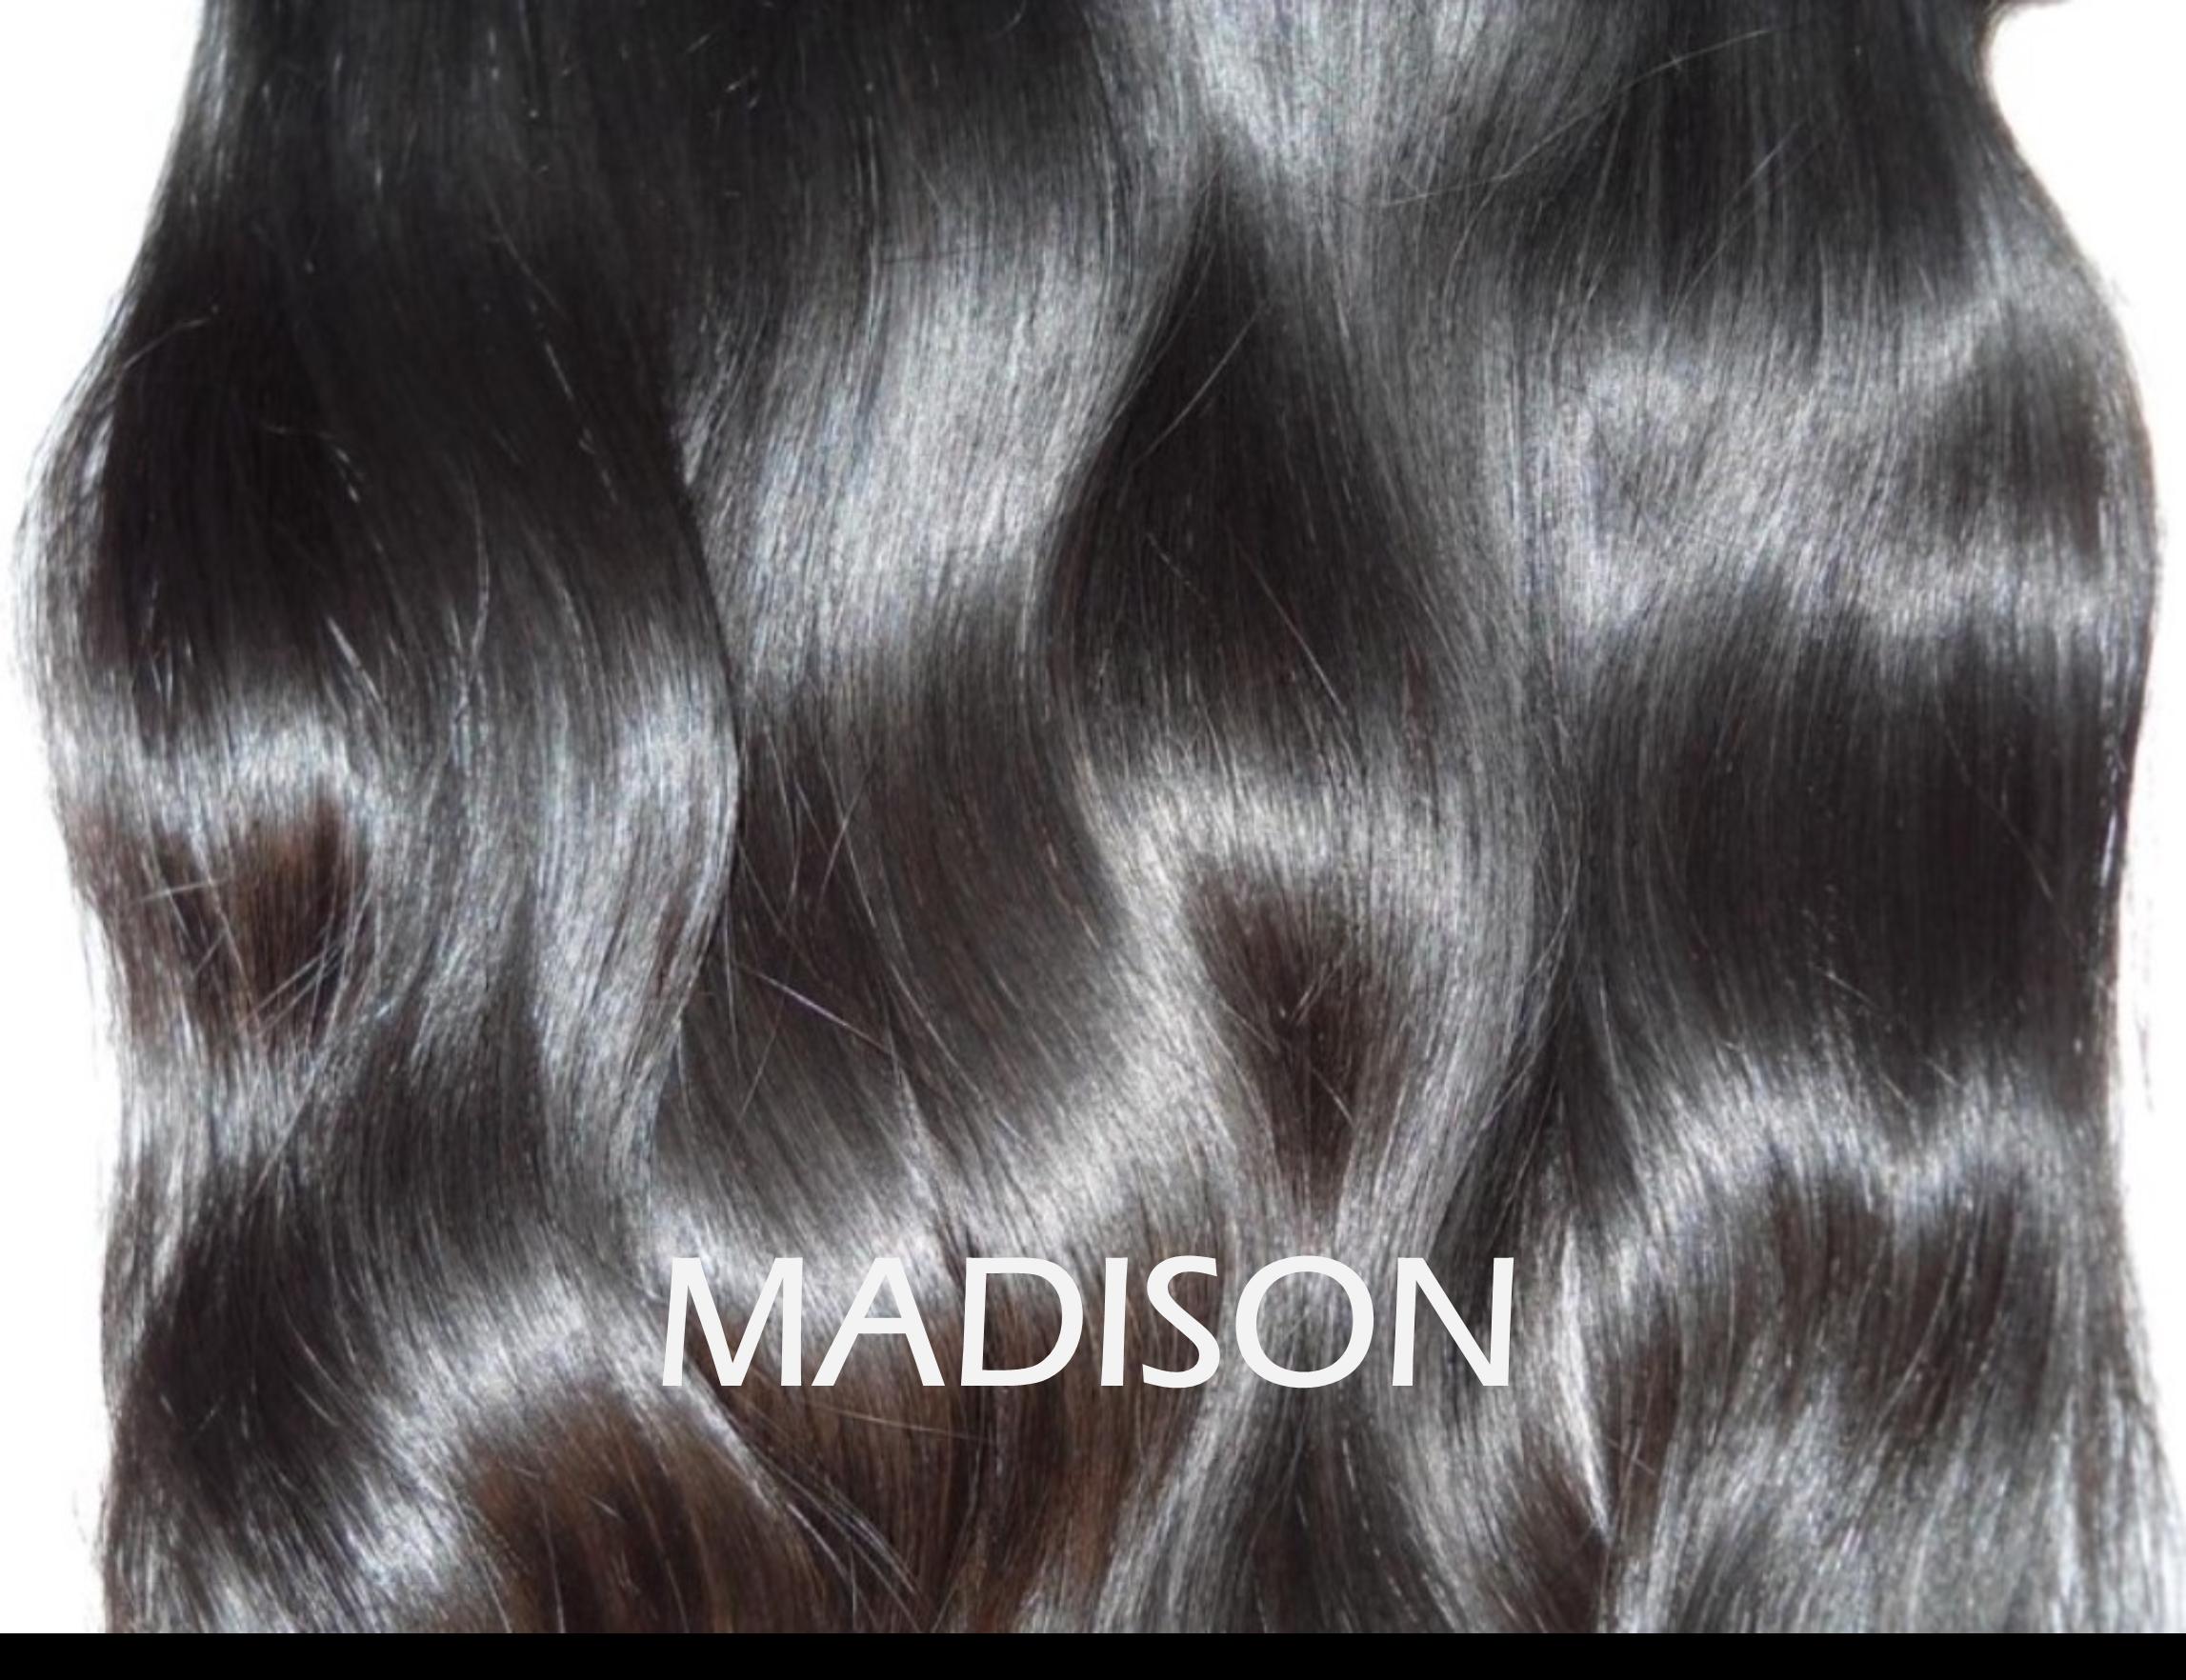 3-4 MADISON.PNG